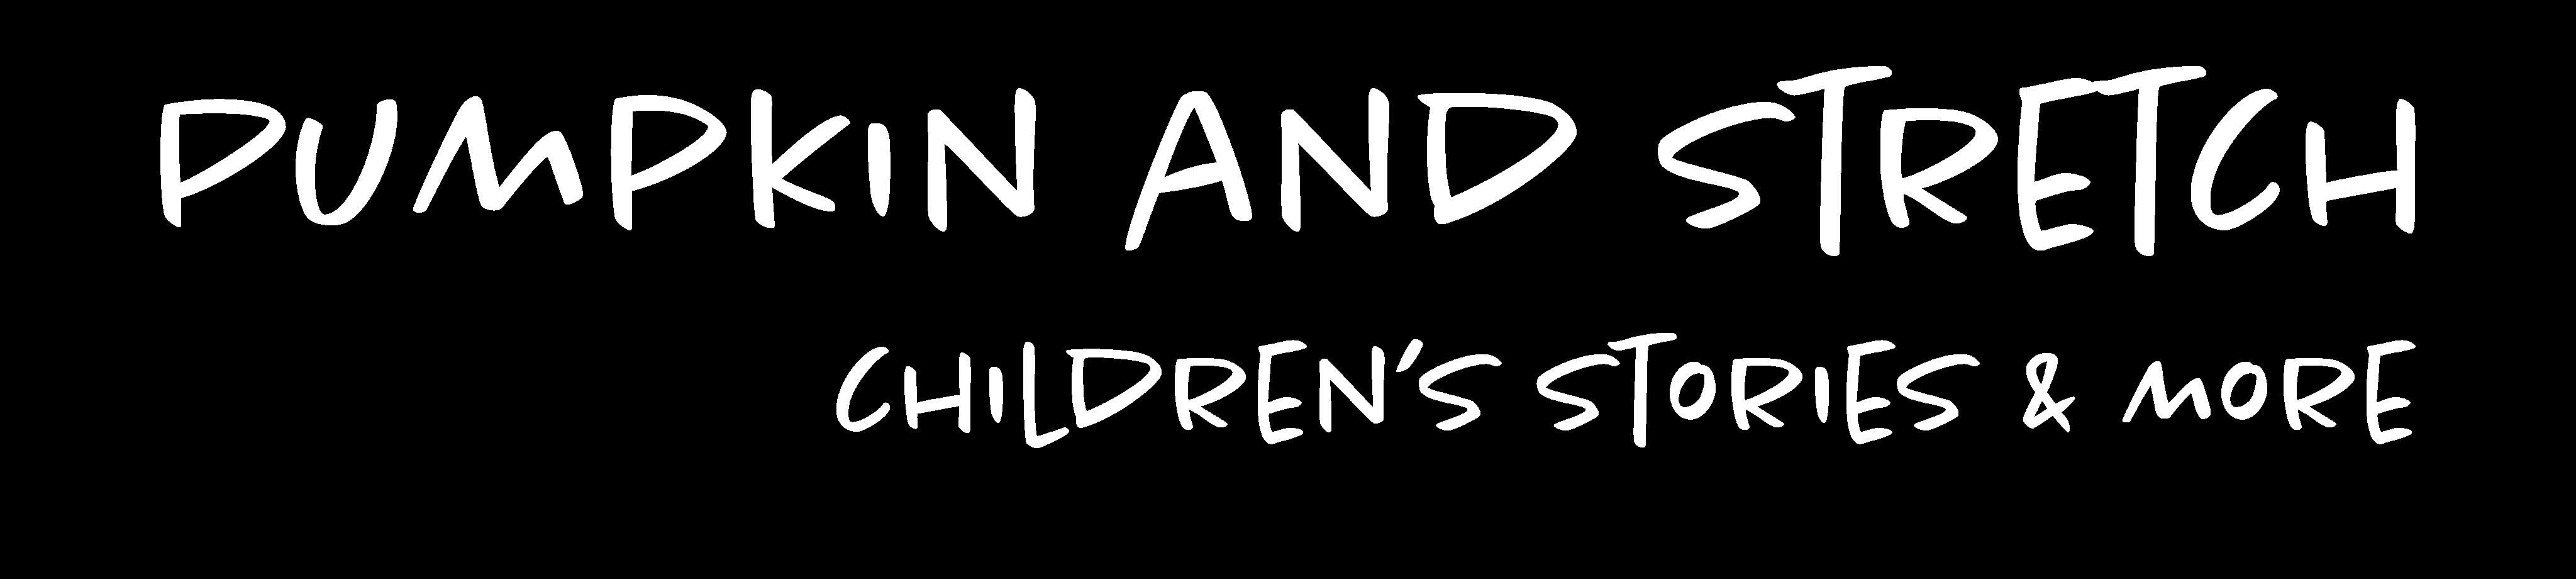 children's stories & more